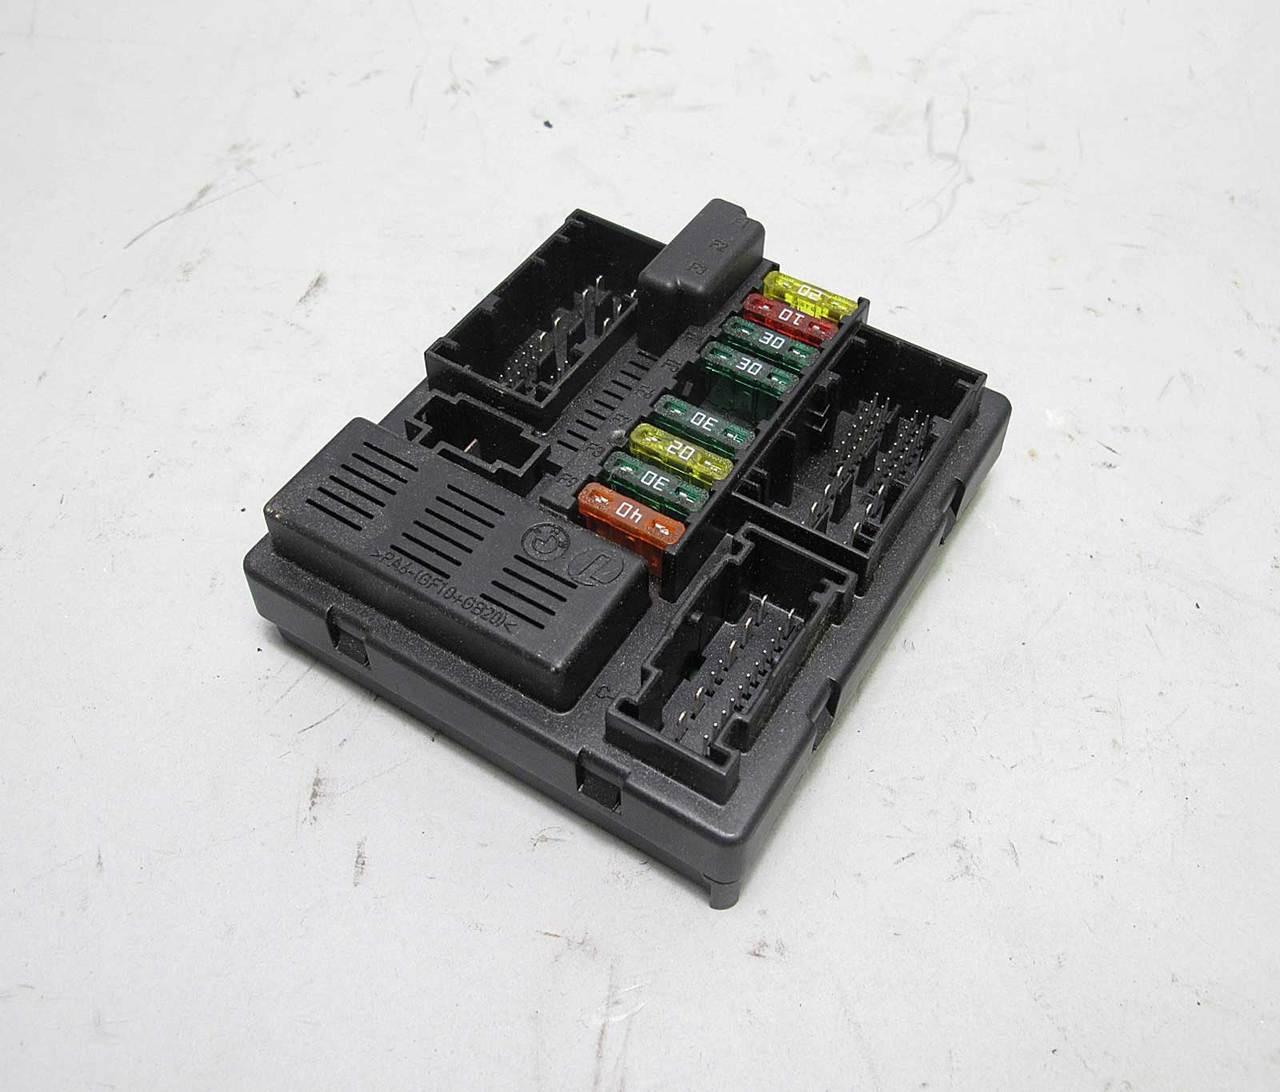 Bmw Z4 X3 30i Under Hood Fuse Box Electrical Distribution Module Location